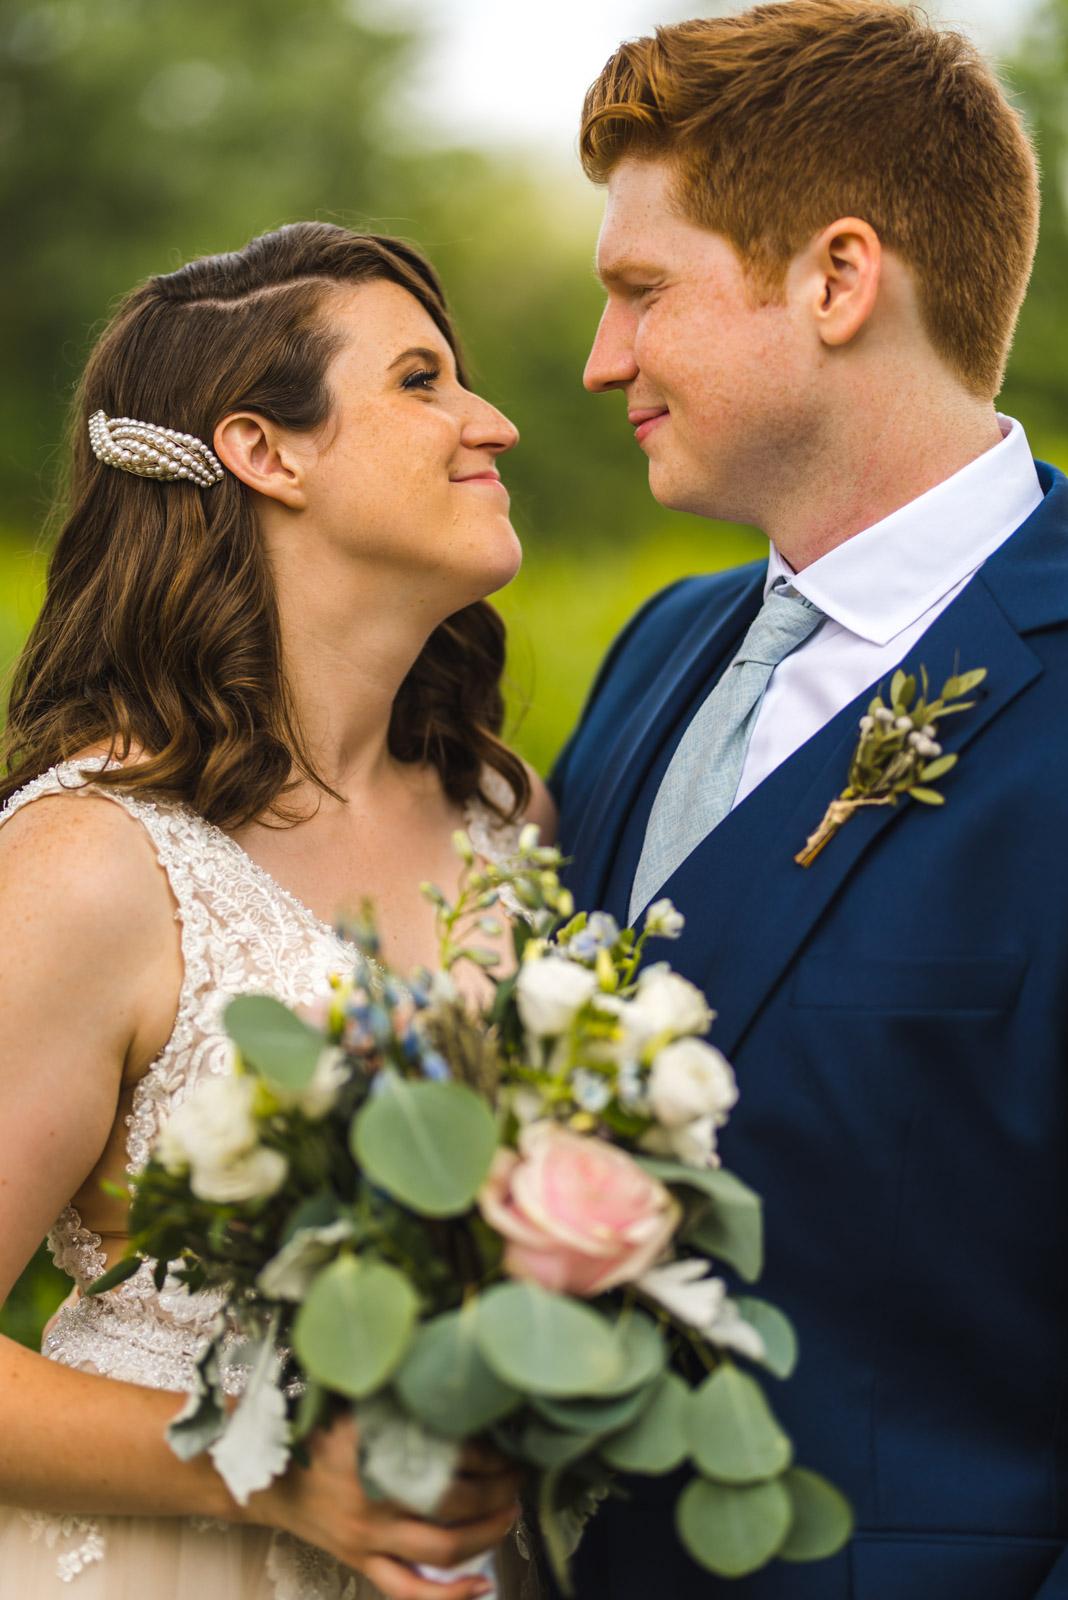 Emerson & Elicia's Golf Course Wedding Aidan & Leanne Hennebry Hamilton Wedding Videographers Photographers Niagara Hush Hush Photography & Film-47.jpg